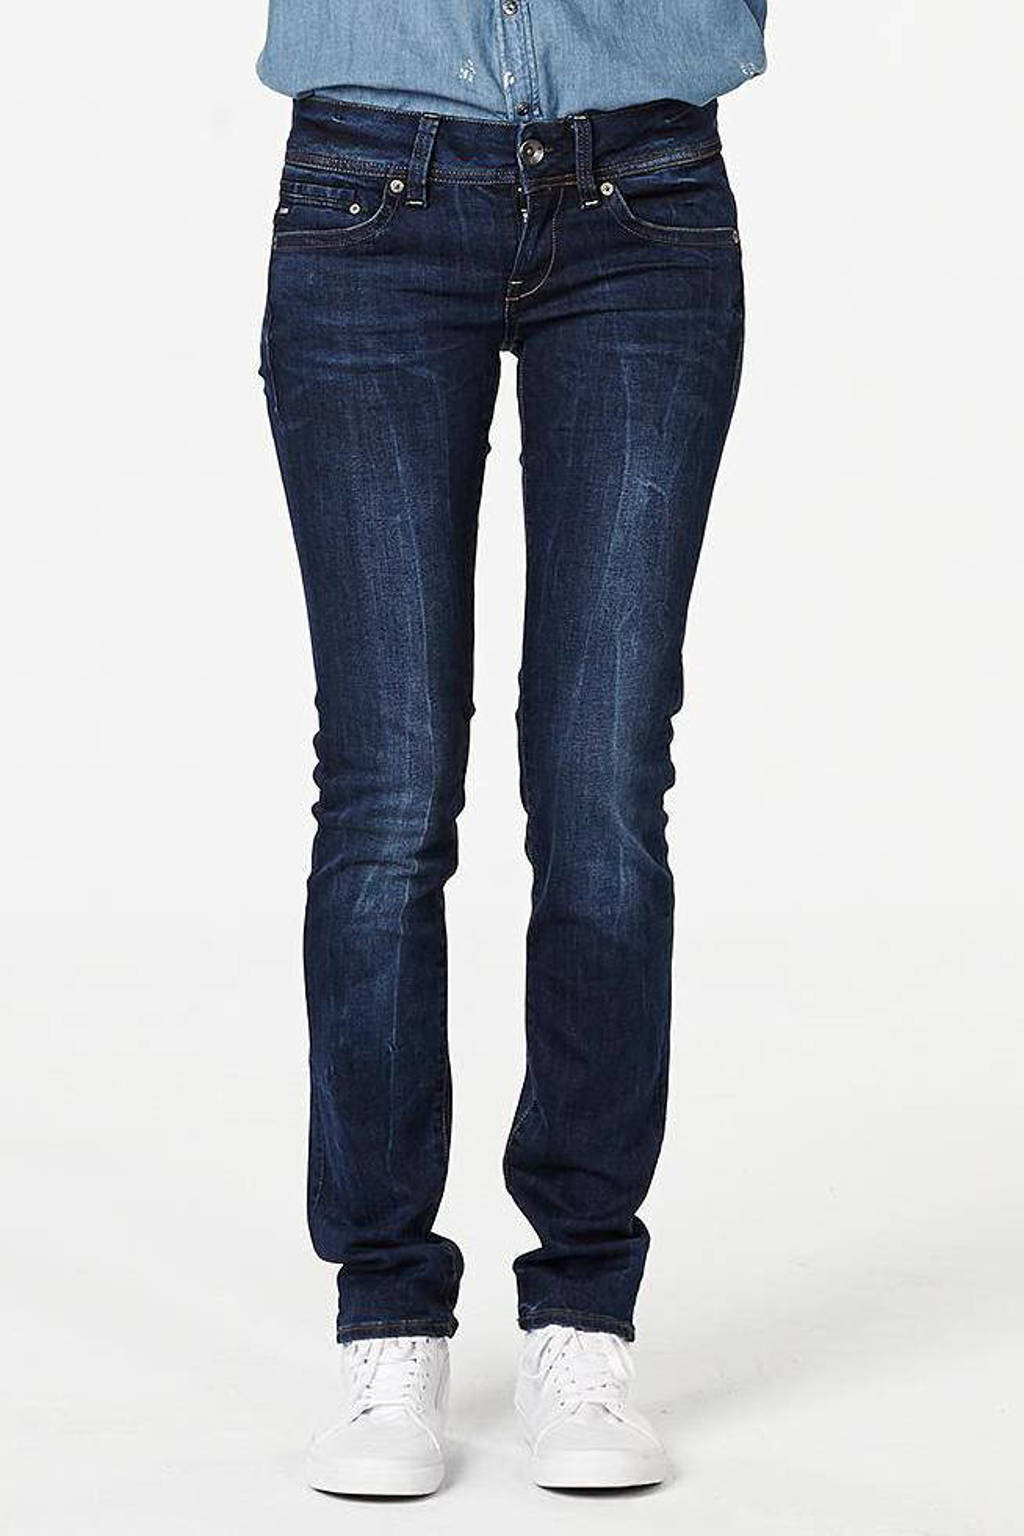 G-Star RAW Midge Saddle Mid Straight fit Jeans, Neutro